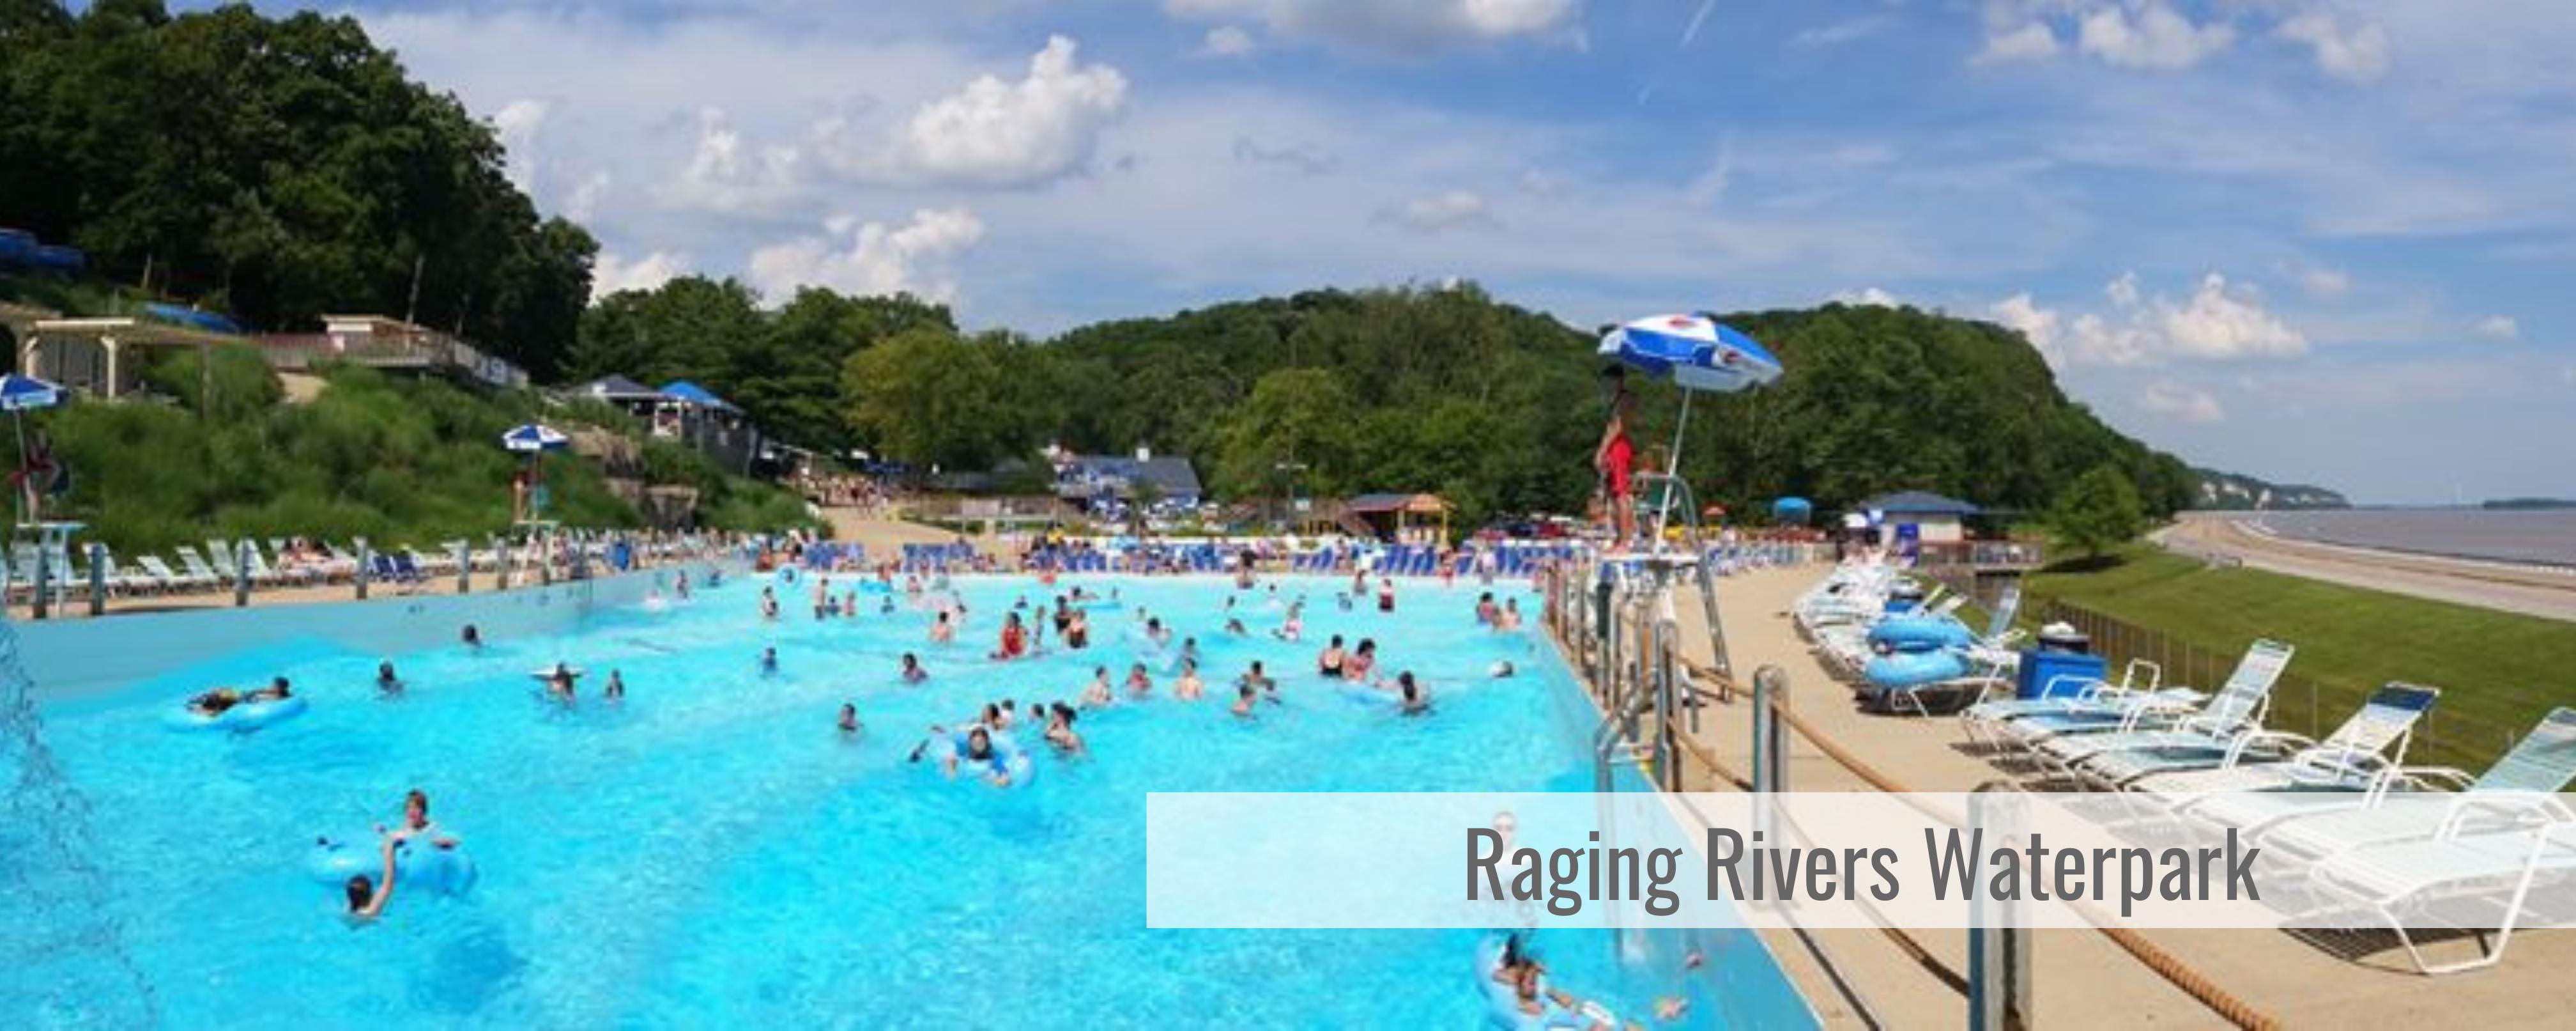 Raging Rivers Waterpark